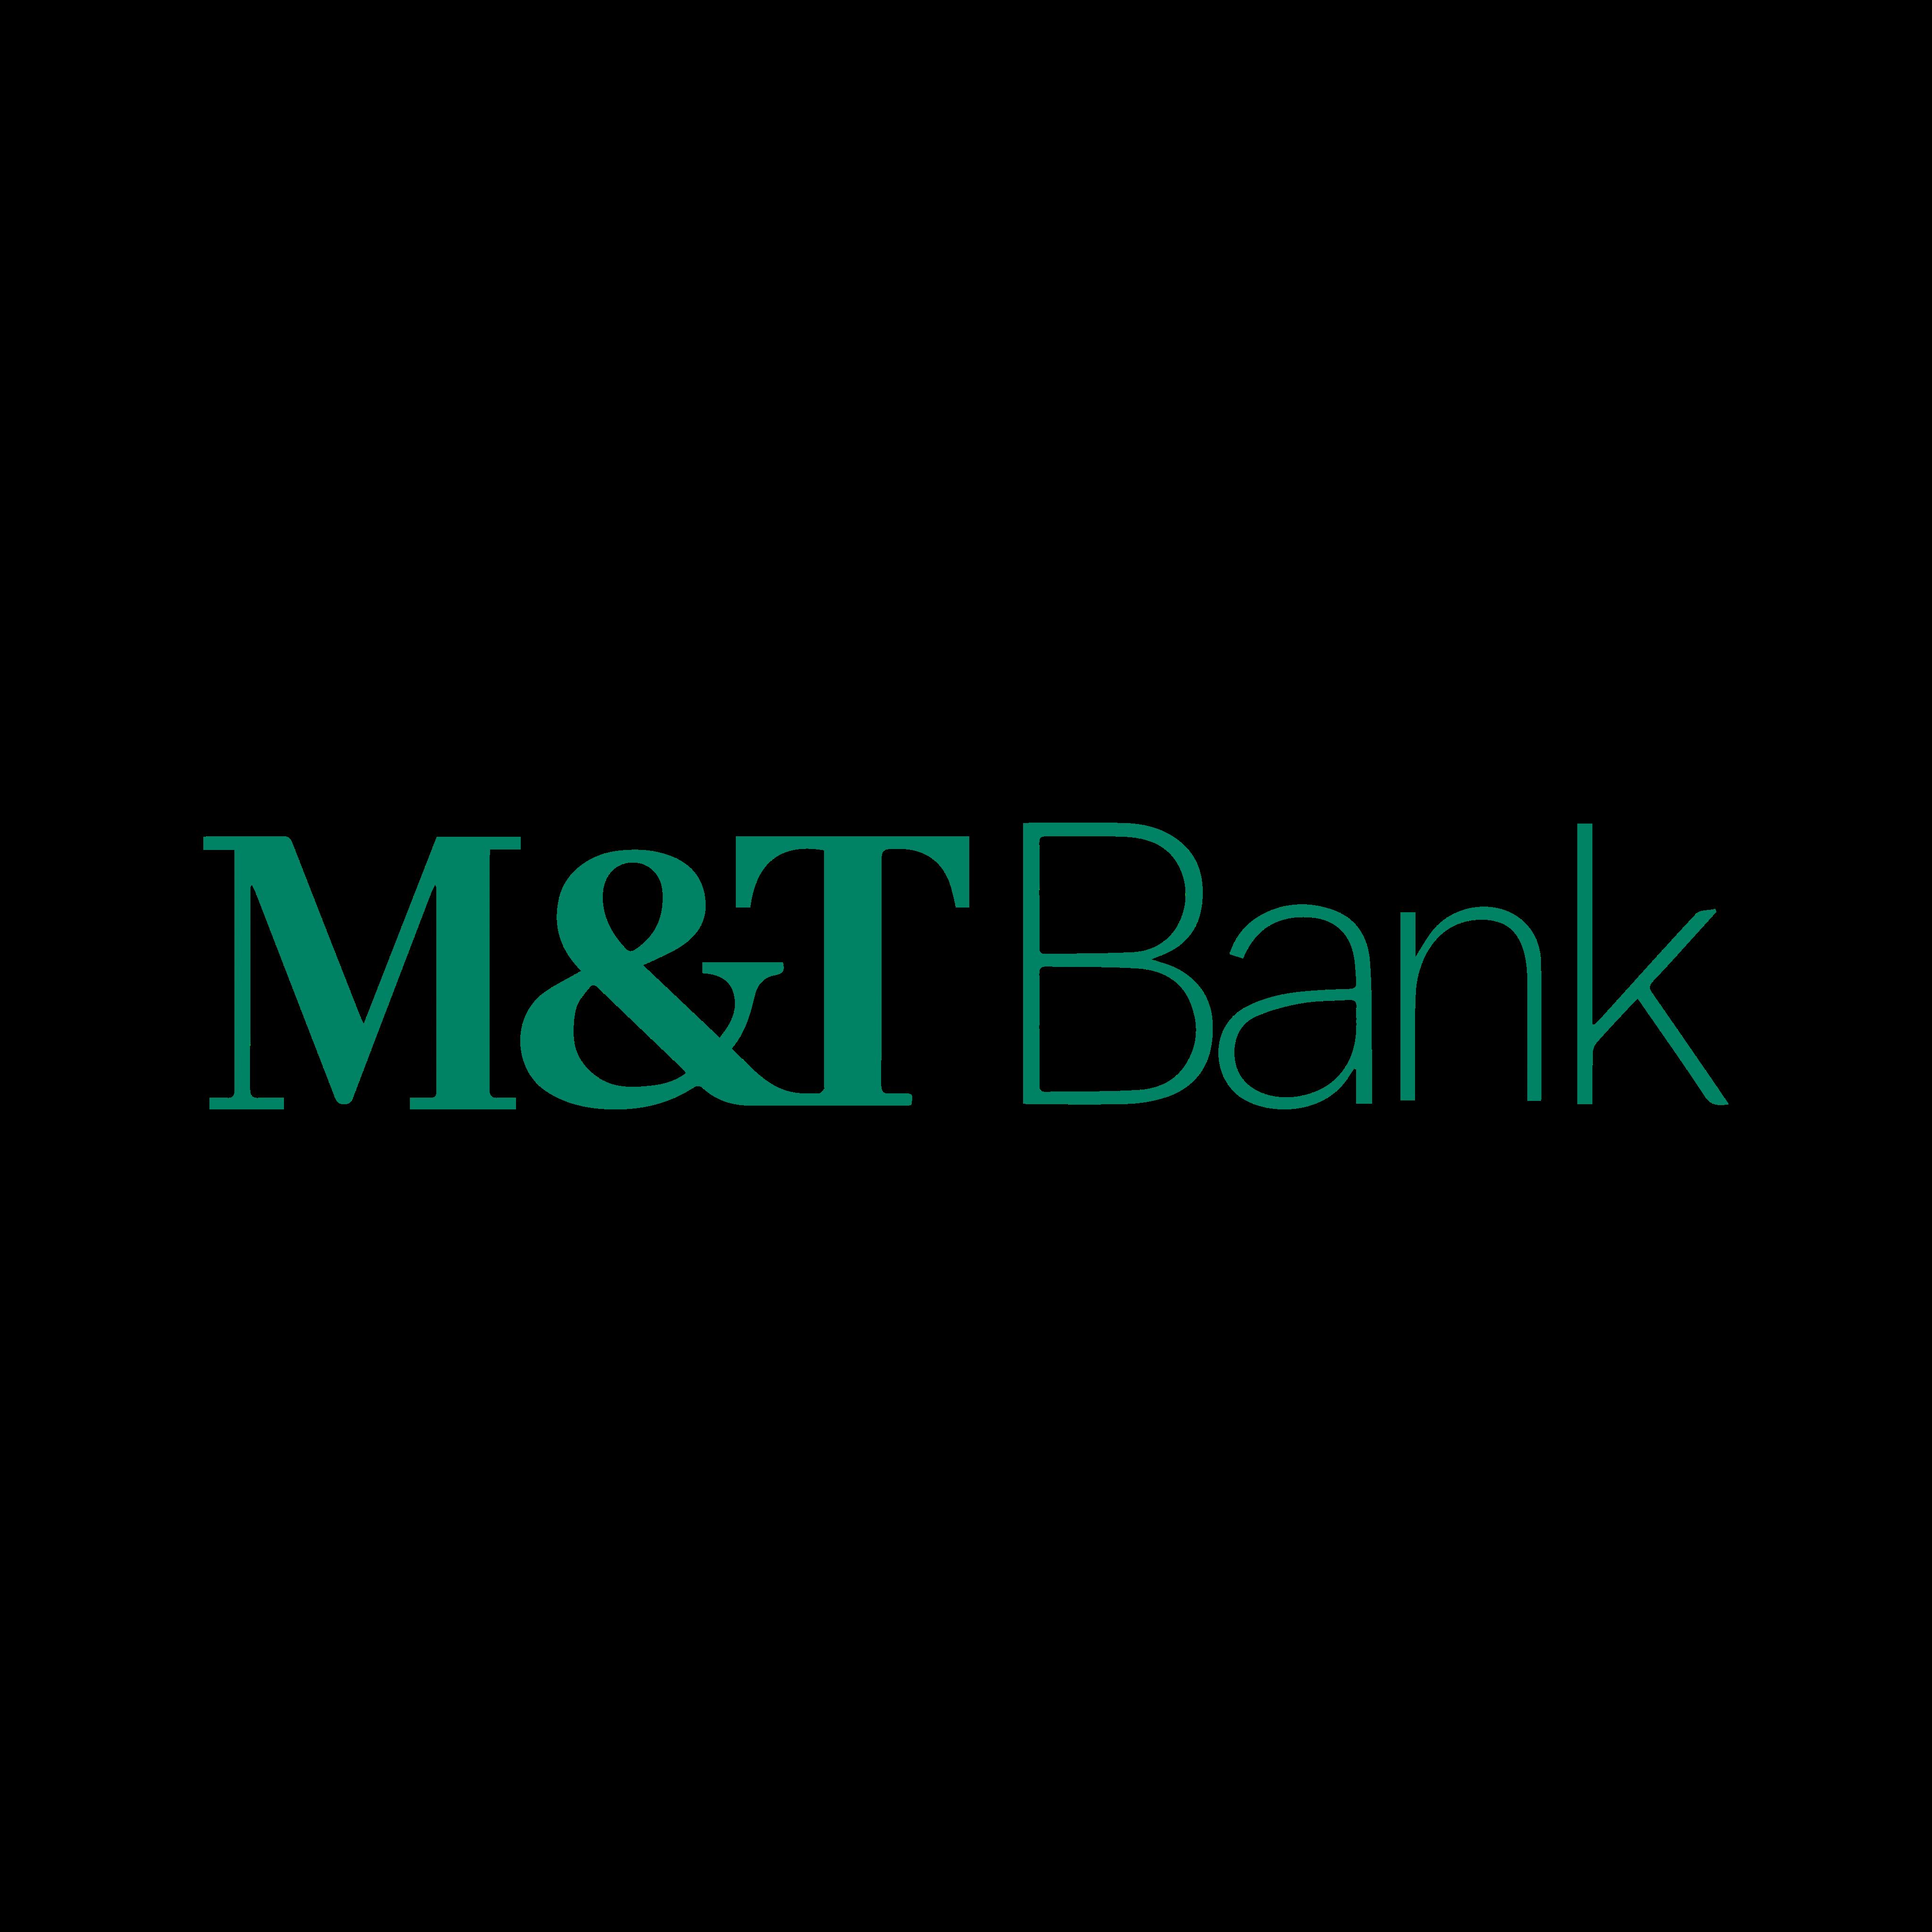 mt bank logo 0 - M&T Bank Logo